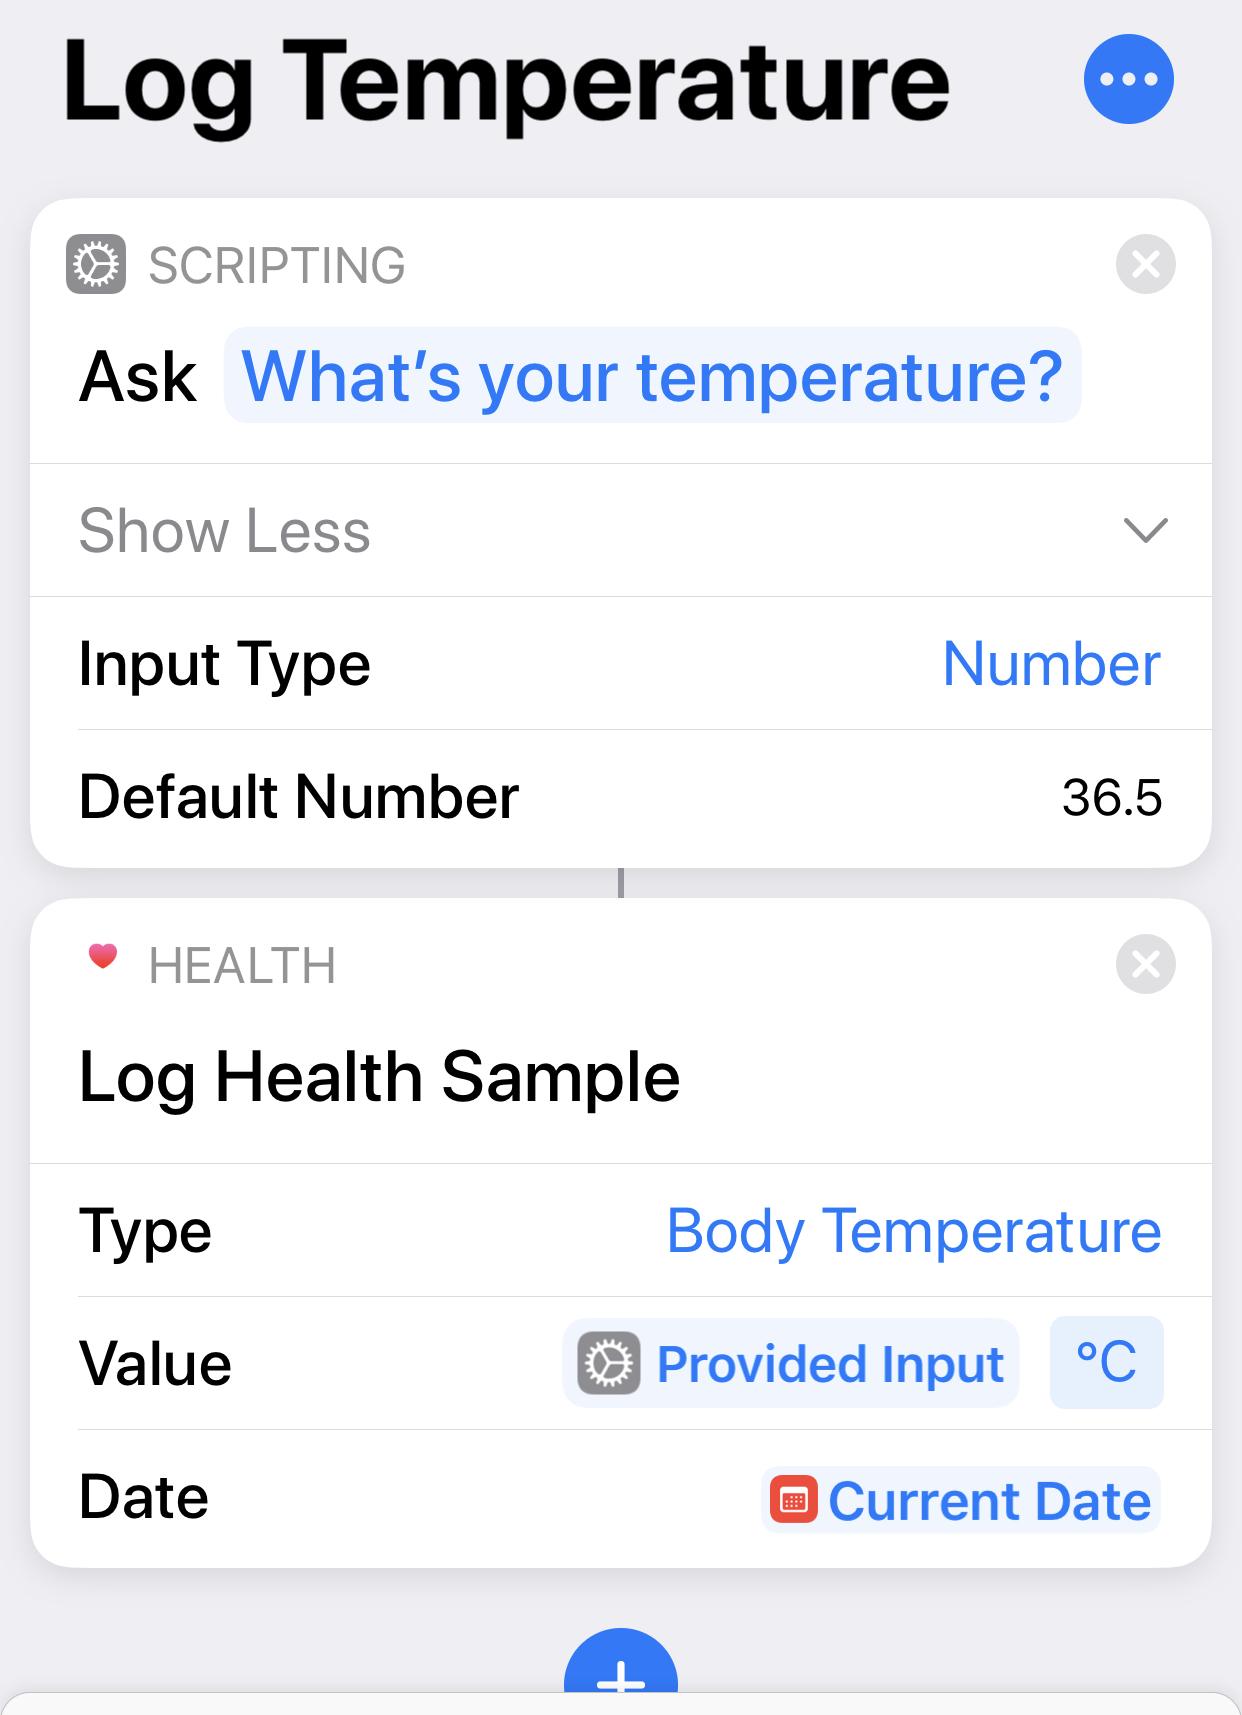 Iphone shortcut to quickly log body temperature [ios]